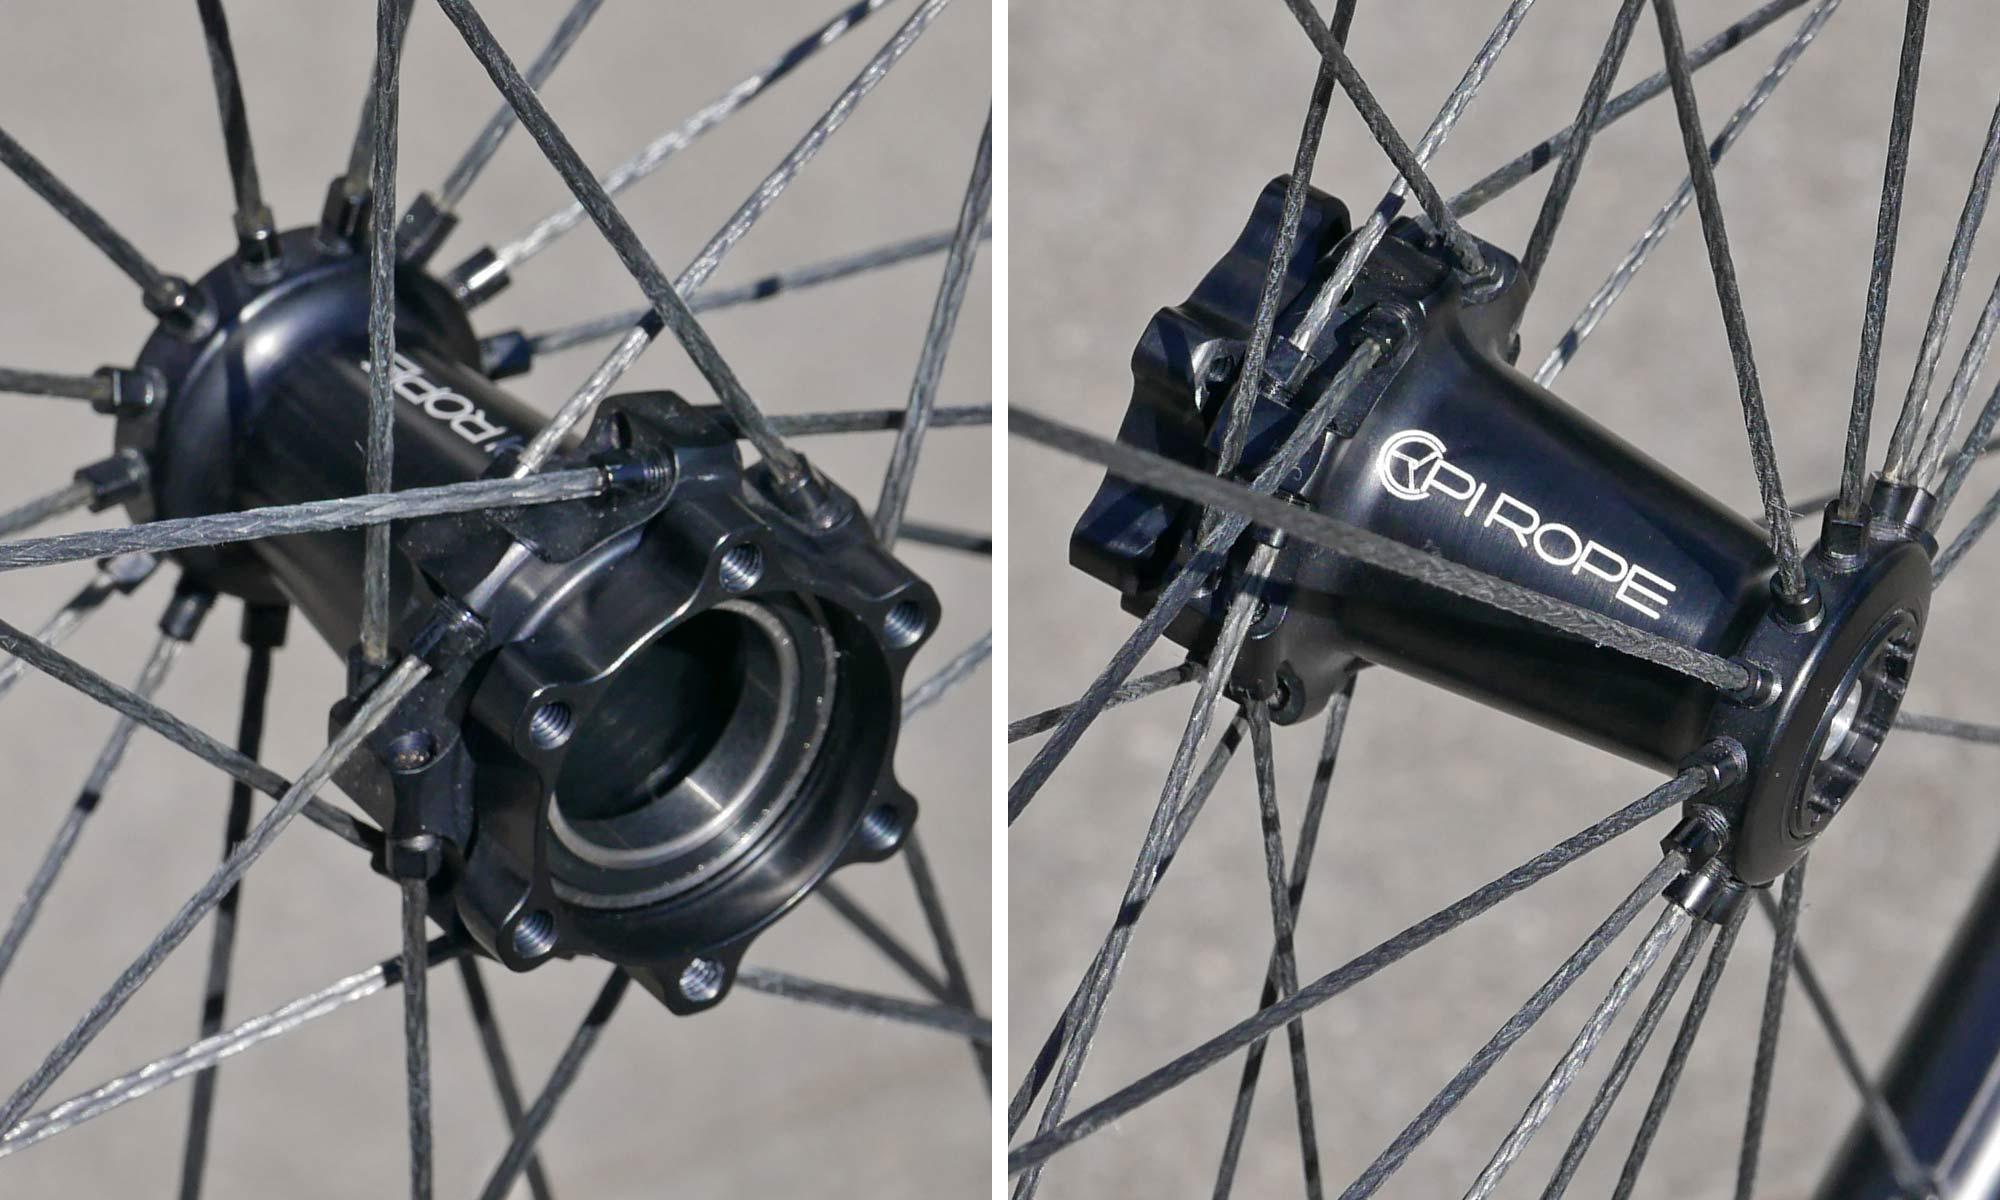 Pi Rope ultralight braided Vectran fiber spoke wheels, Cannondale Lefty hub